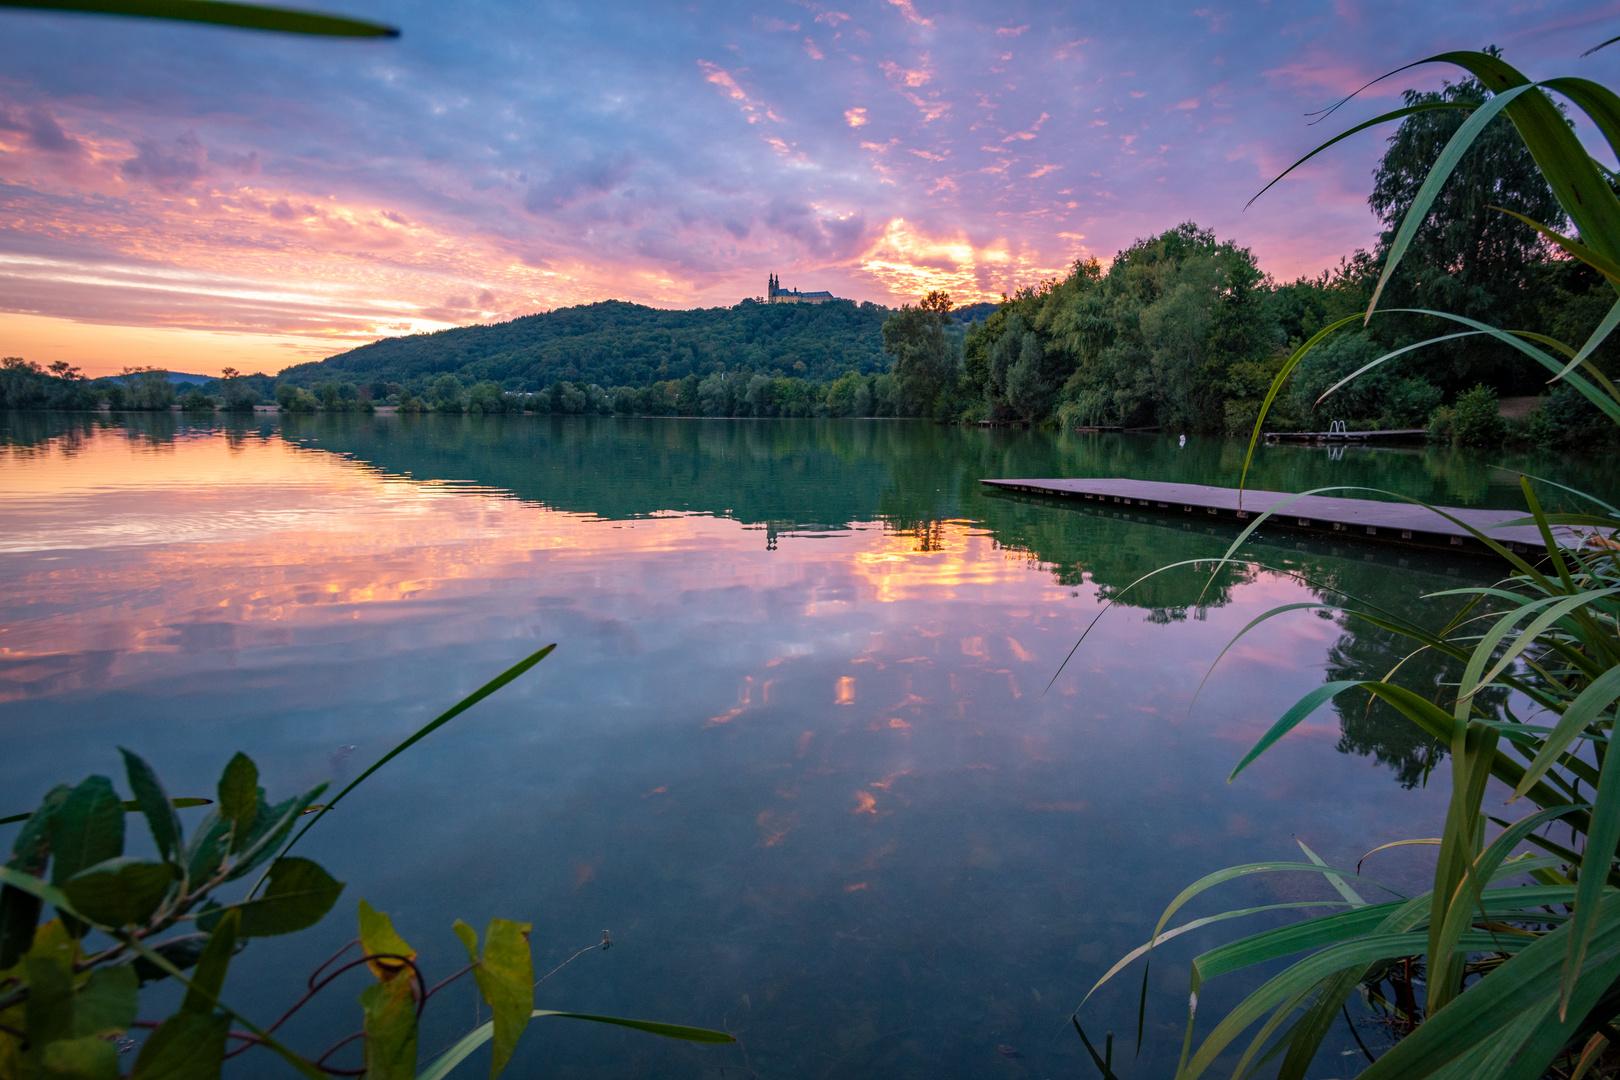 Waldsee Reundorf